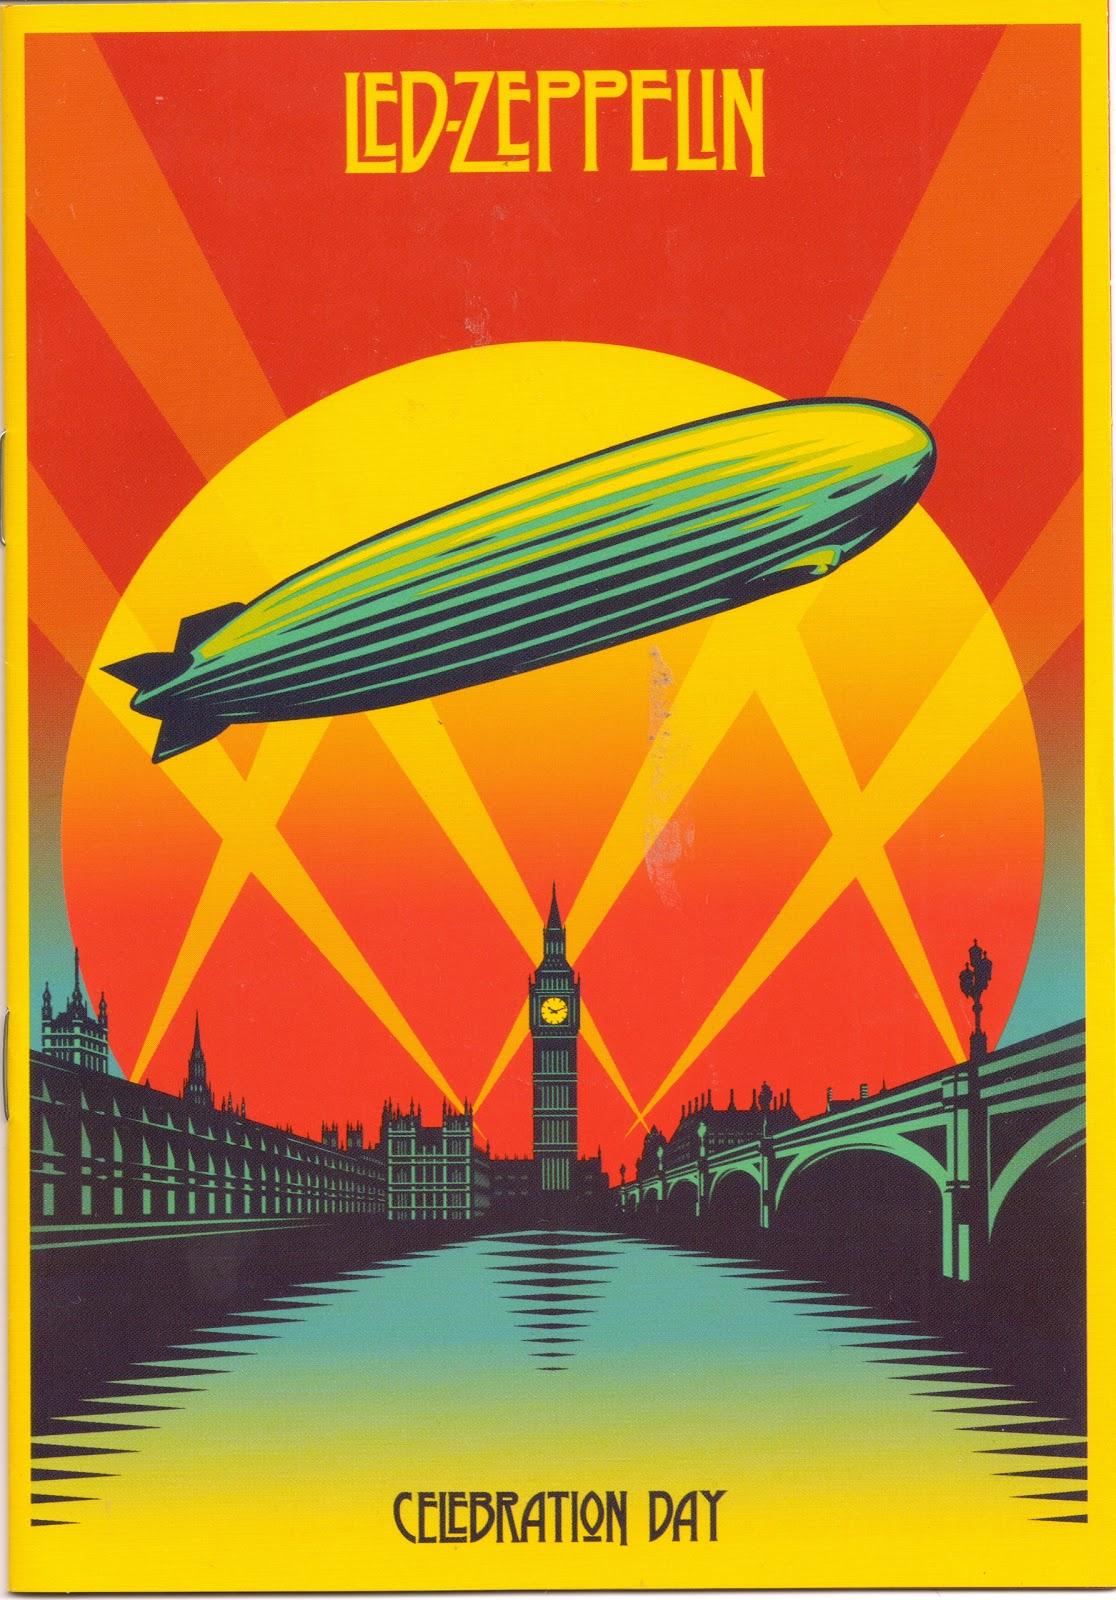 Led Zeppelin regroups for one last 'Celebration Day'